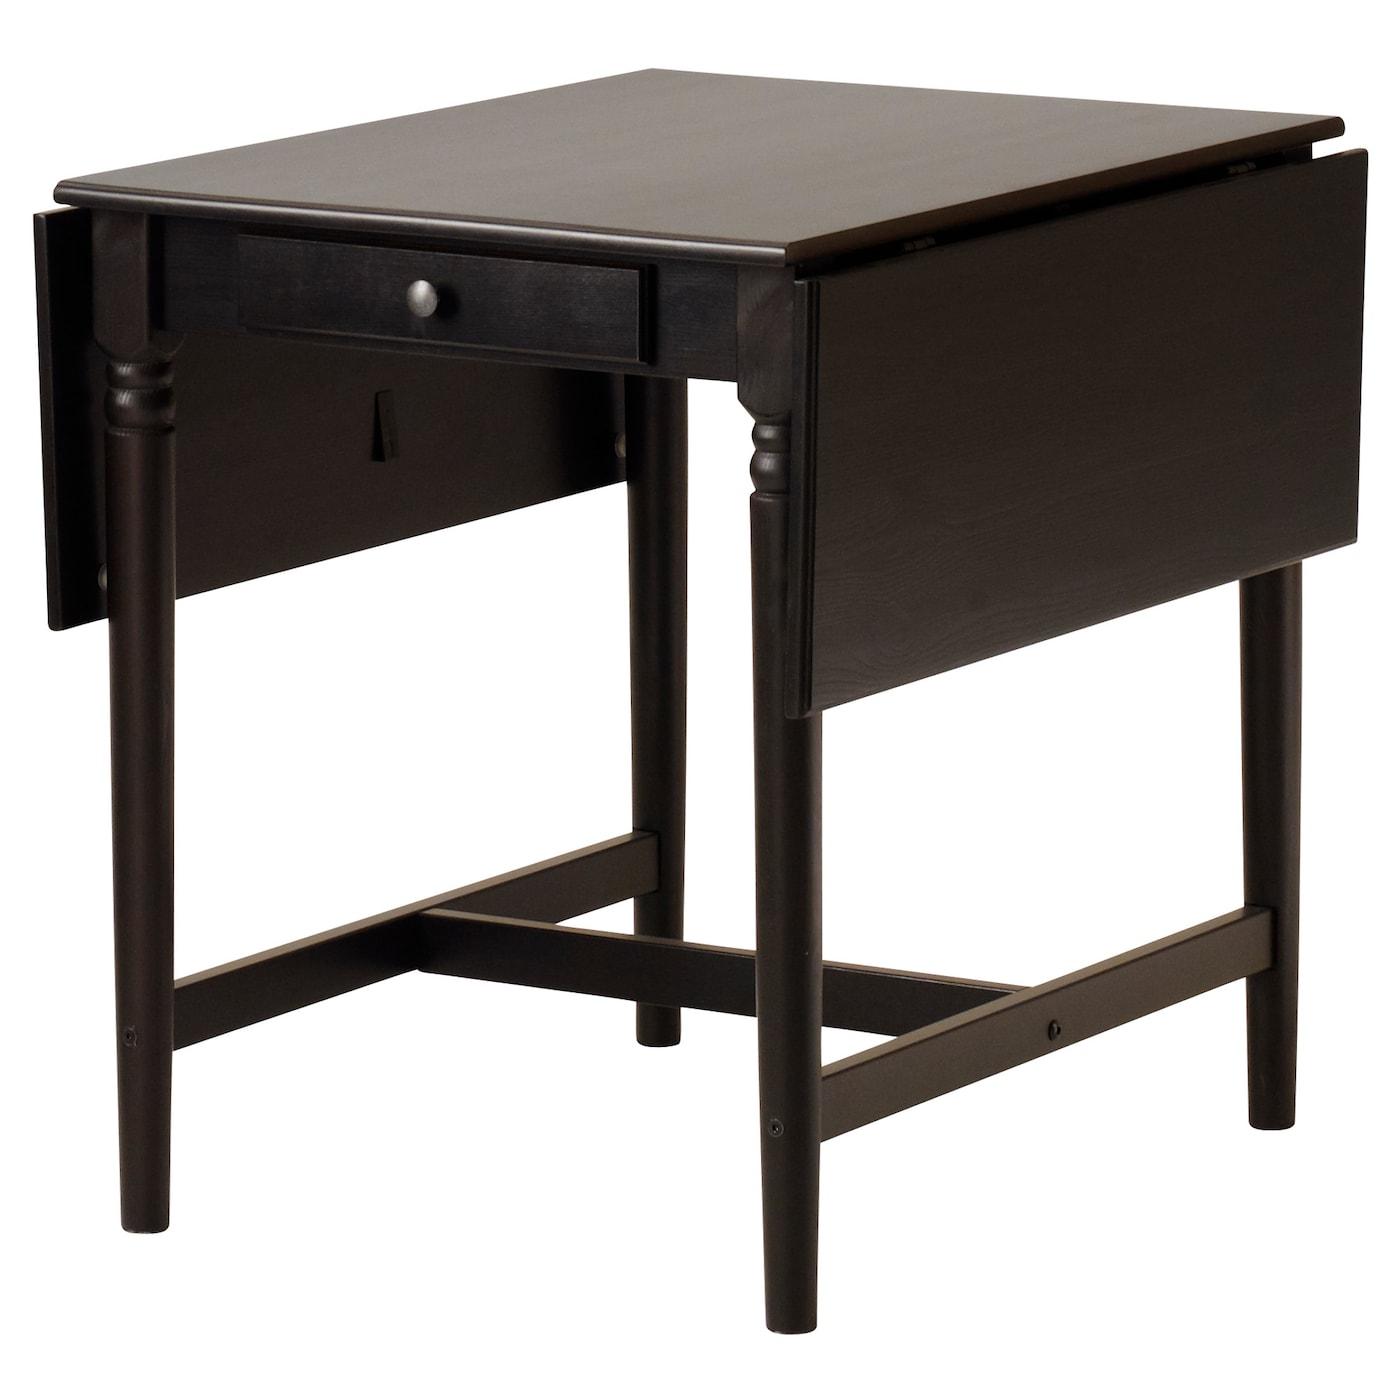 Mesas de Comedor | Compra Online IKEA